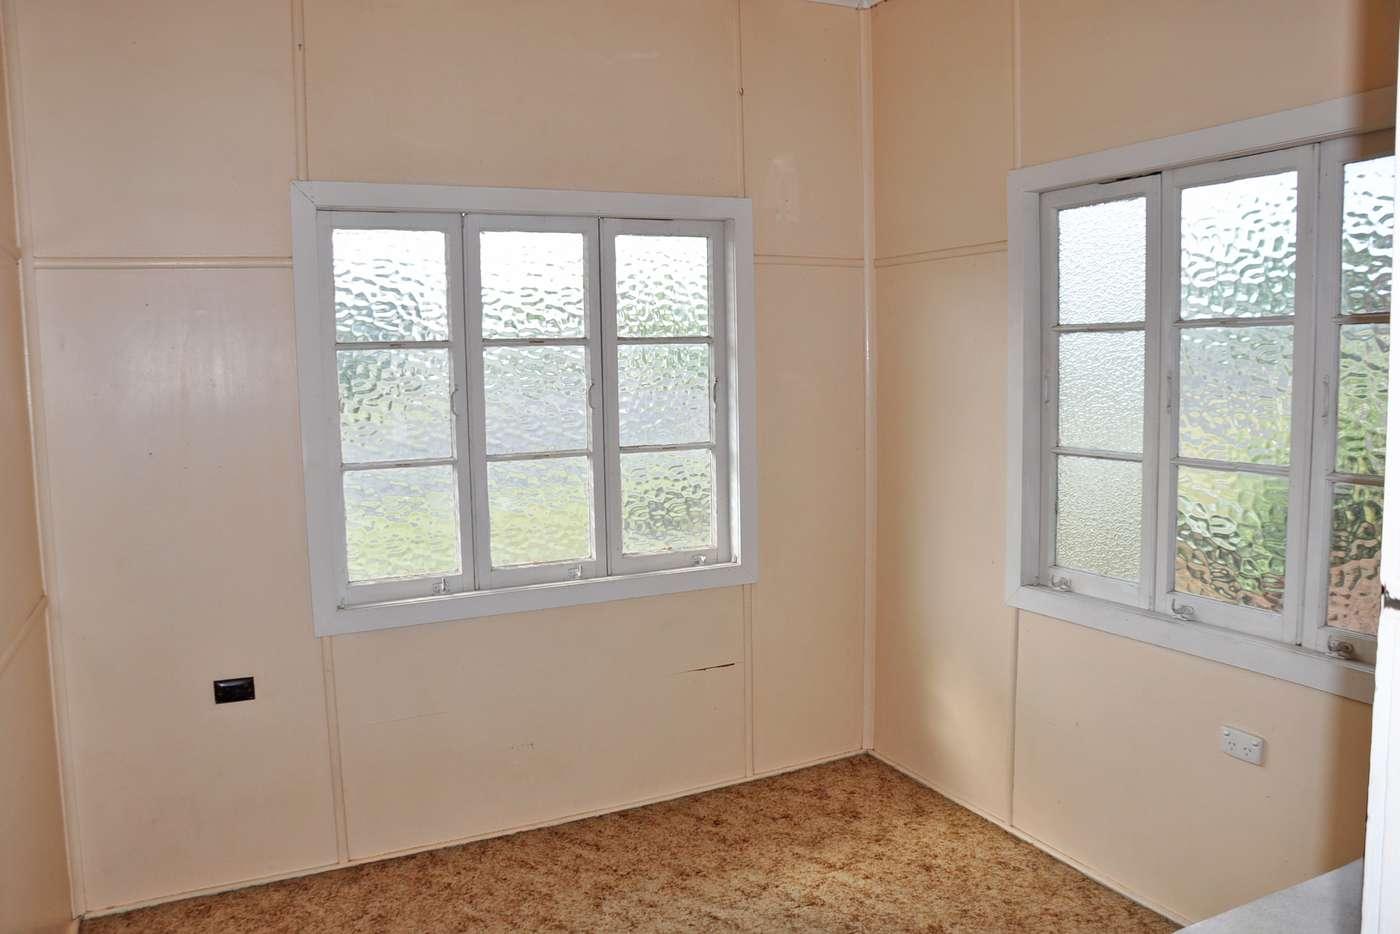 Seventh view of Homely house listing, 58 Mason Street, Mareeba QLD 4880